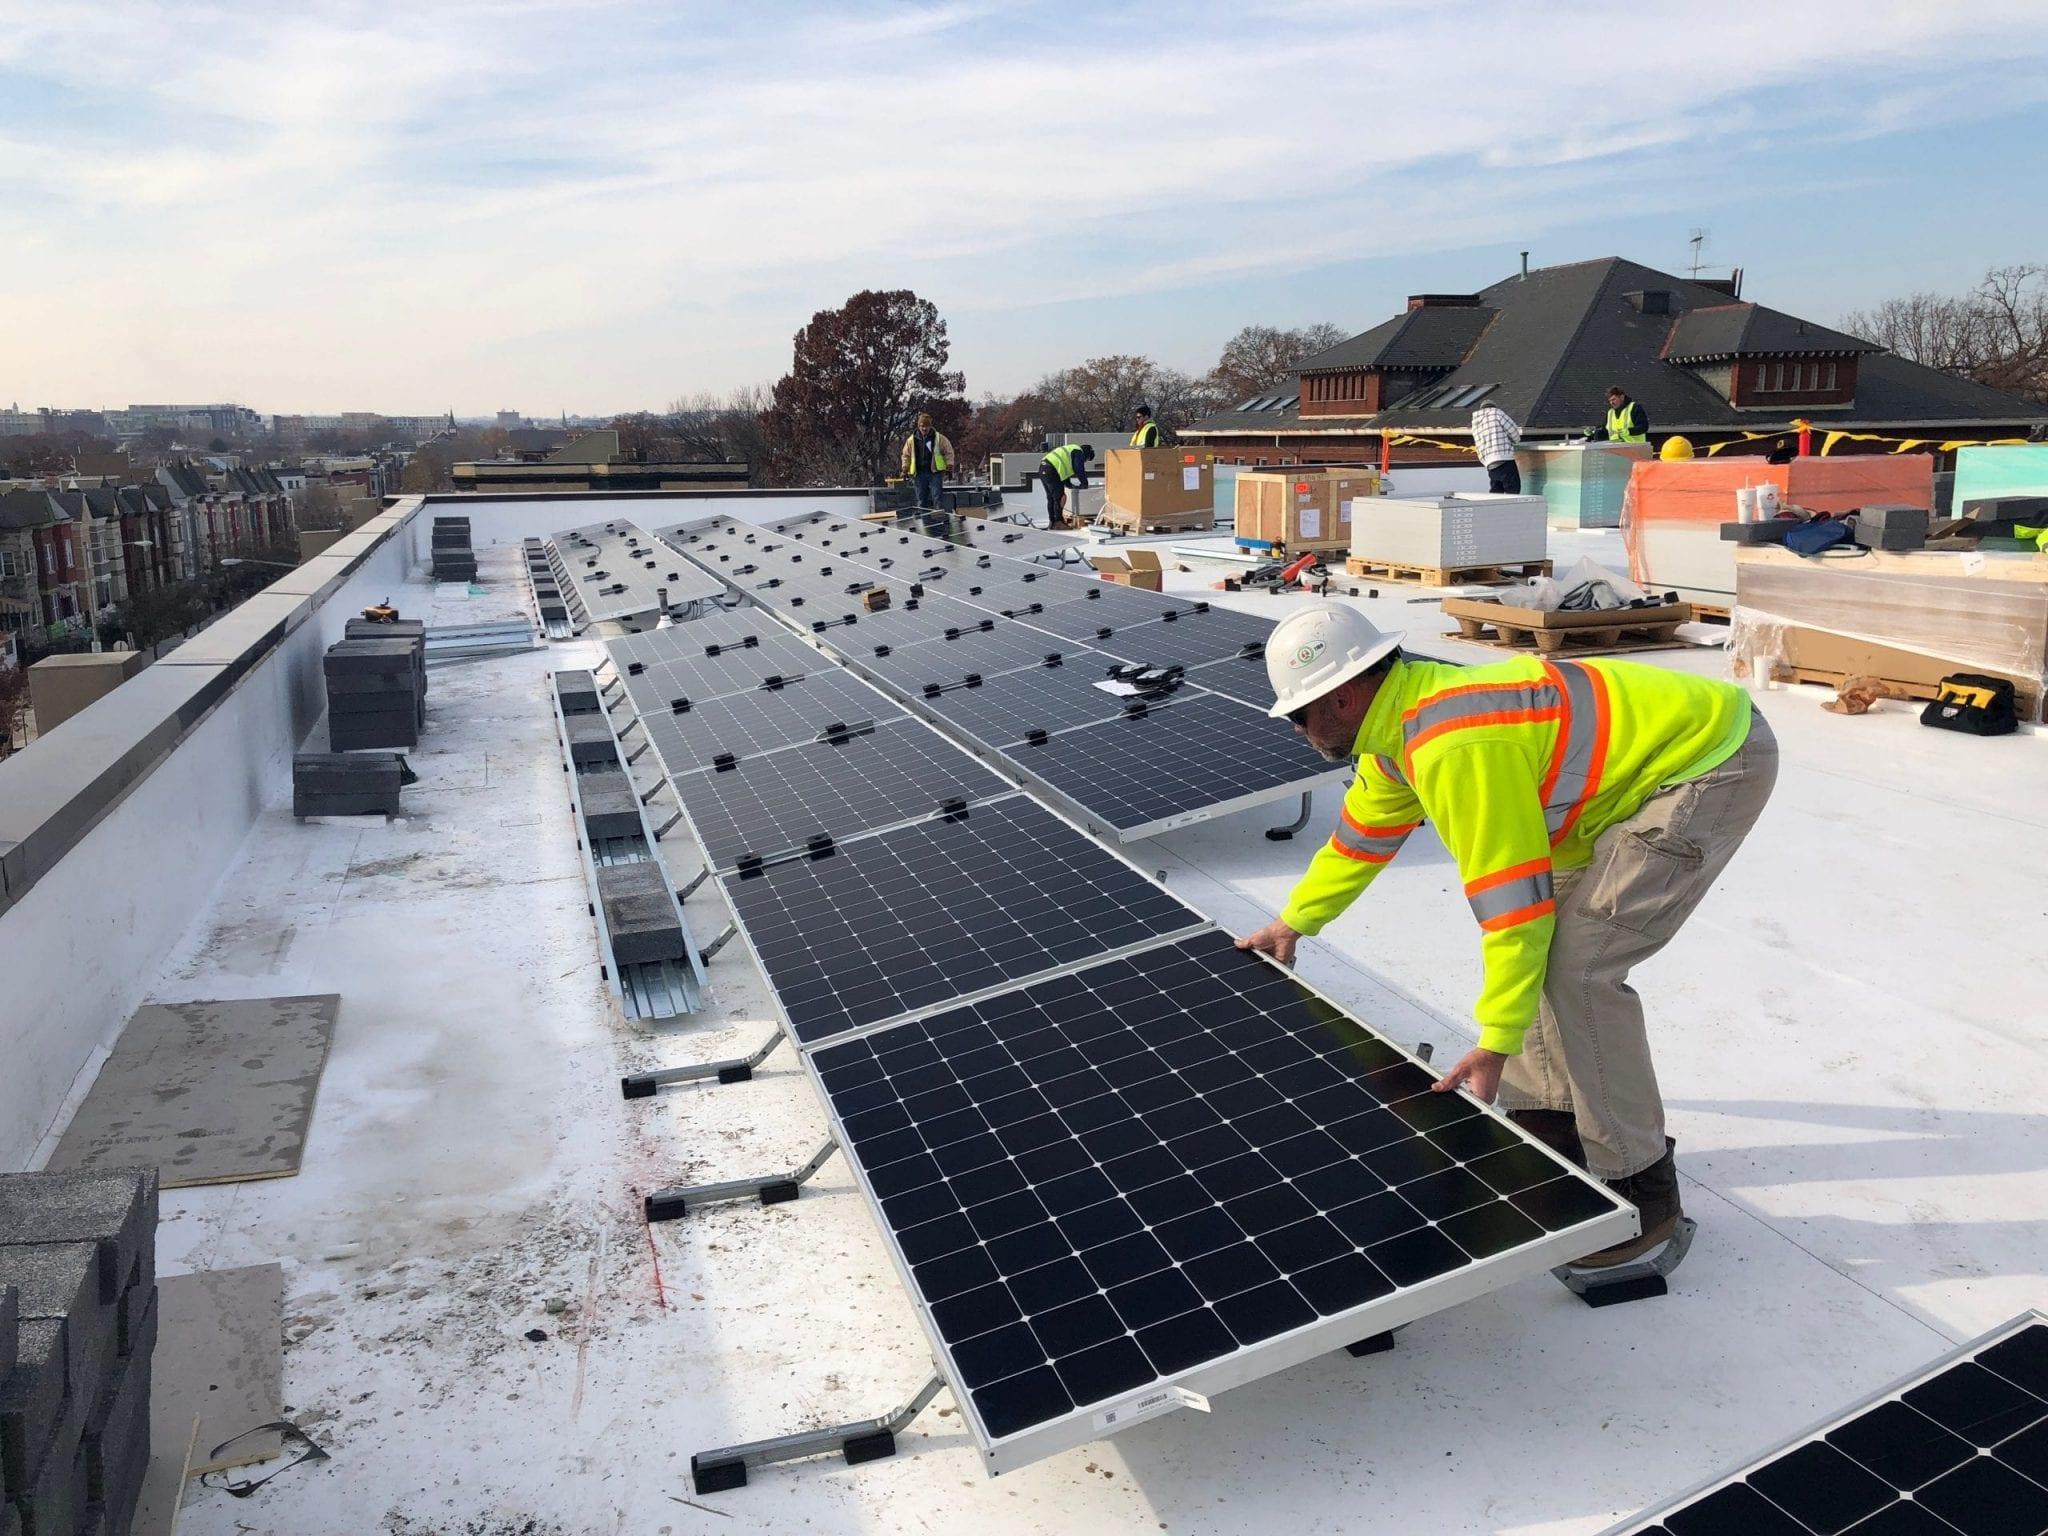 Washington DC rooftop solar installation construction